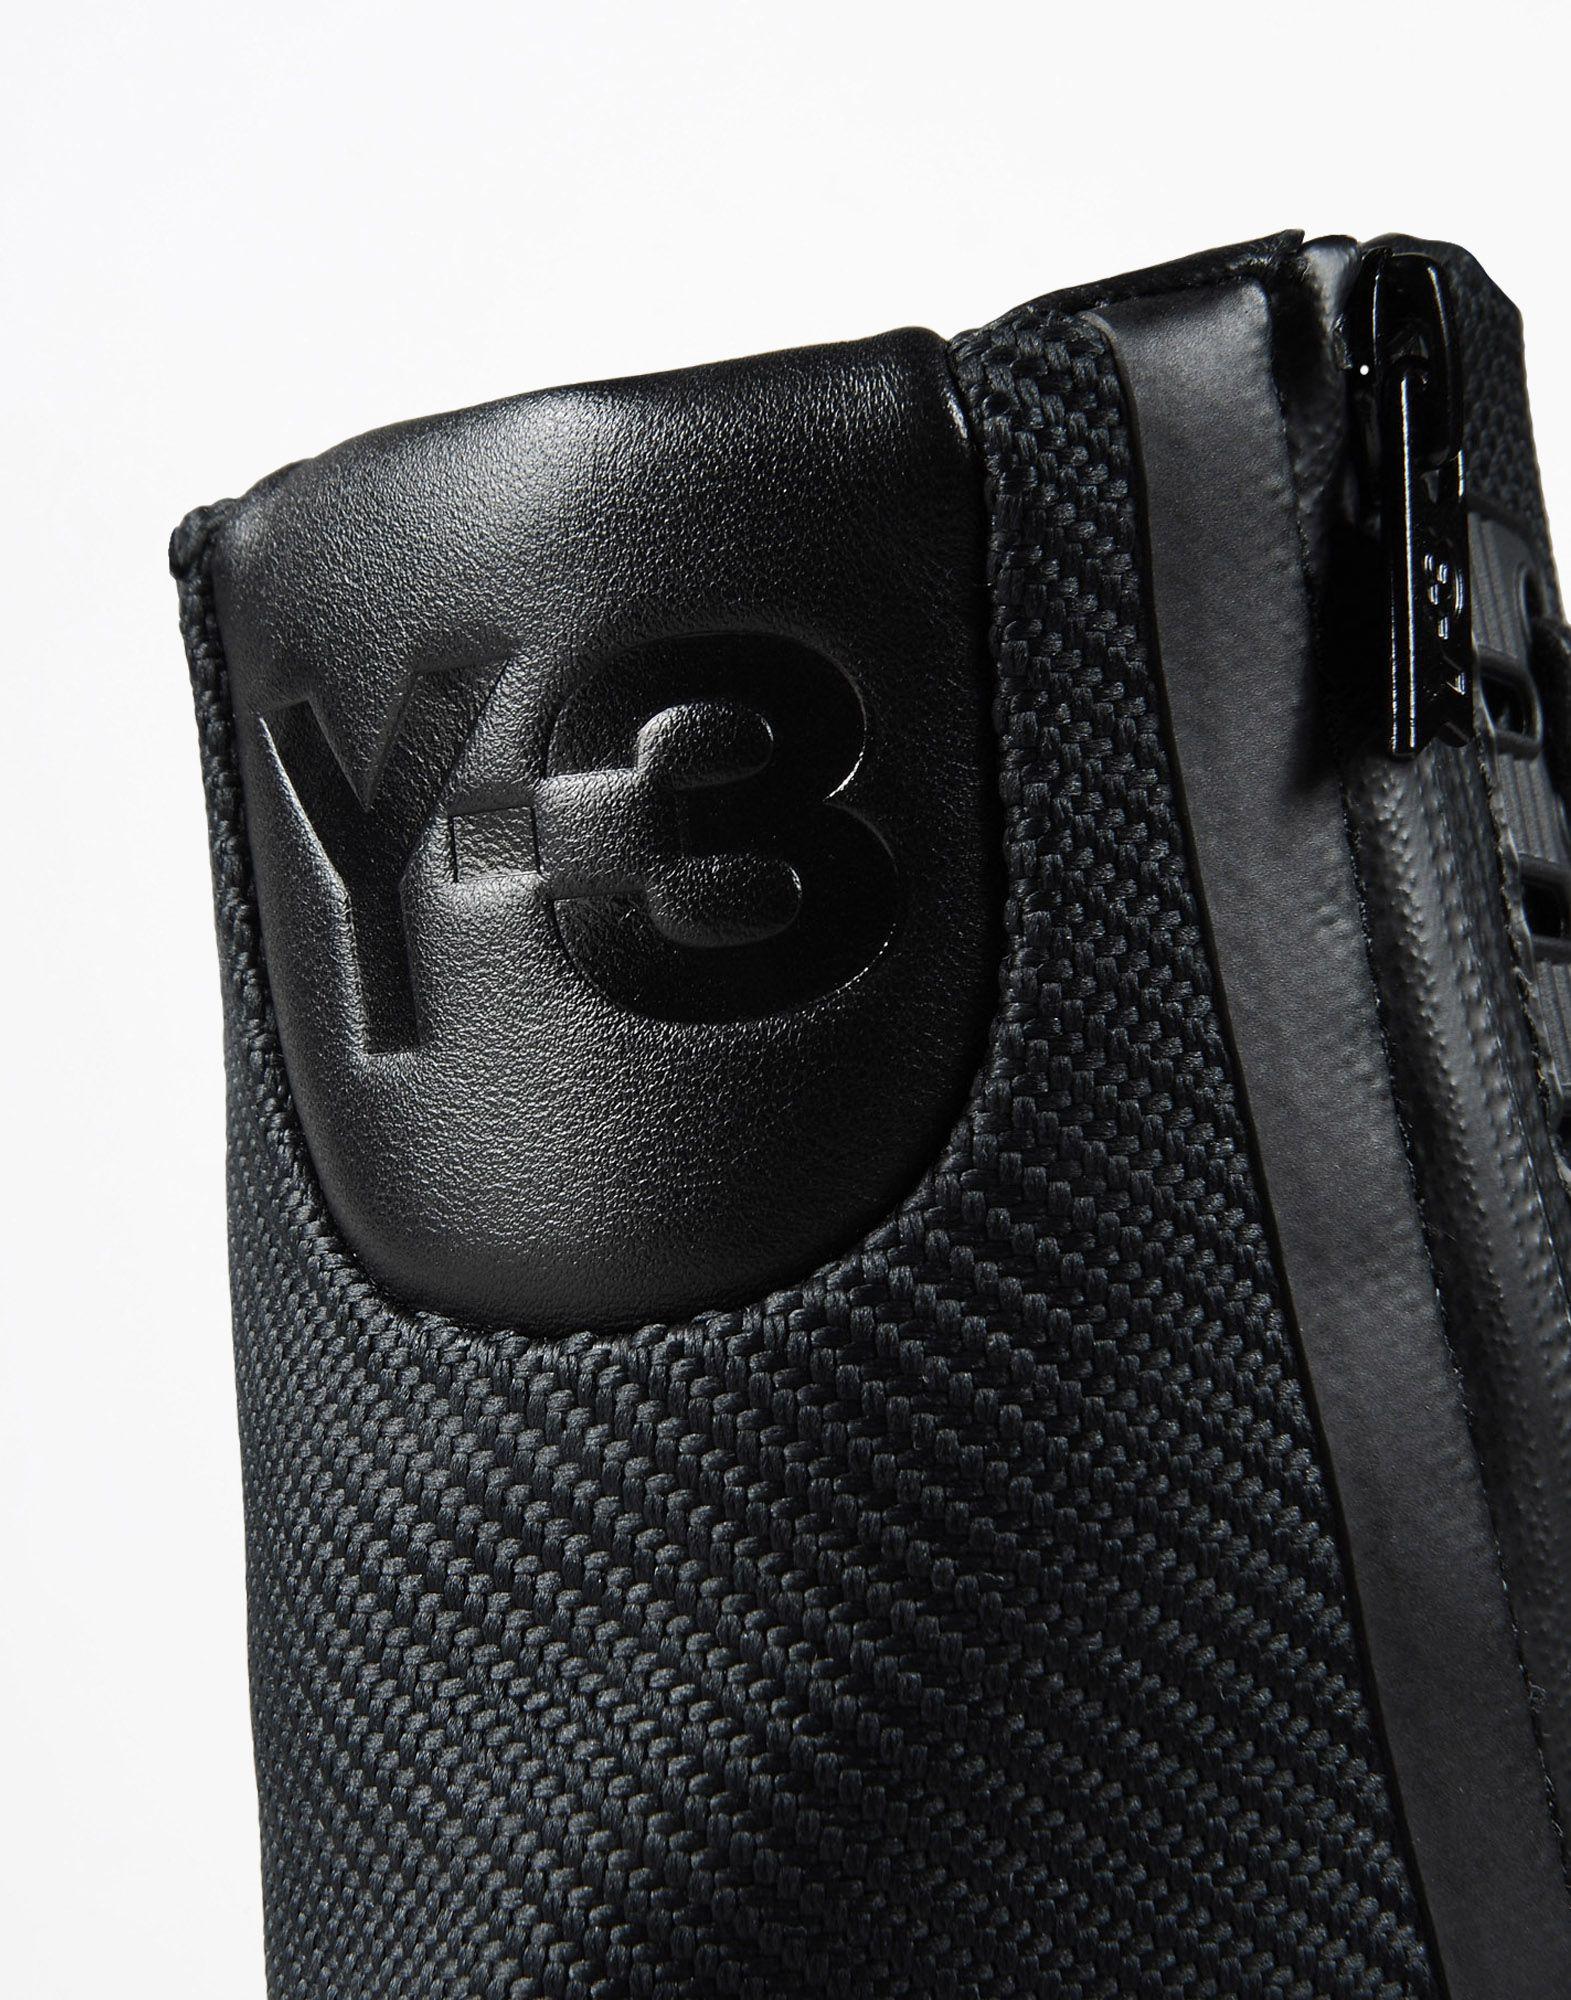 Sneakers 3 Adidas Y Site Boot Officiel Qasa Montantes qU7dSPtx